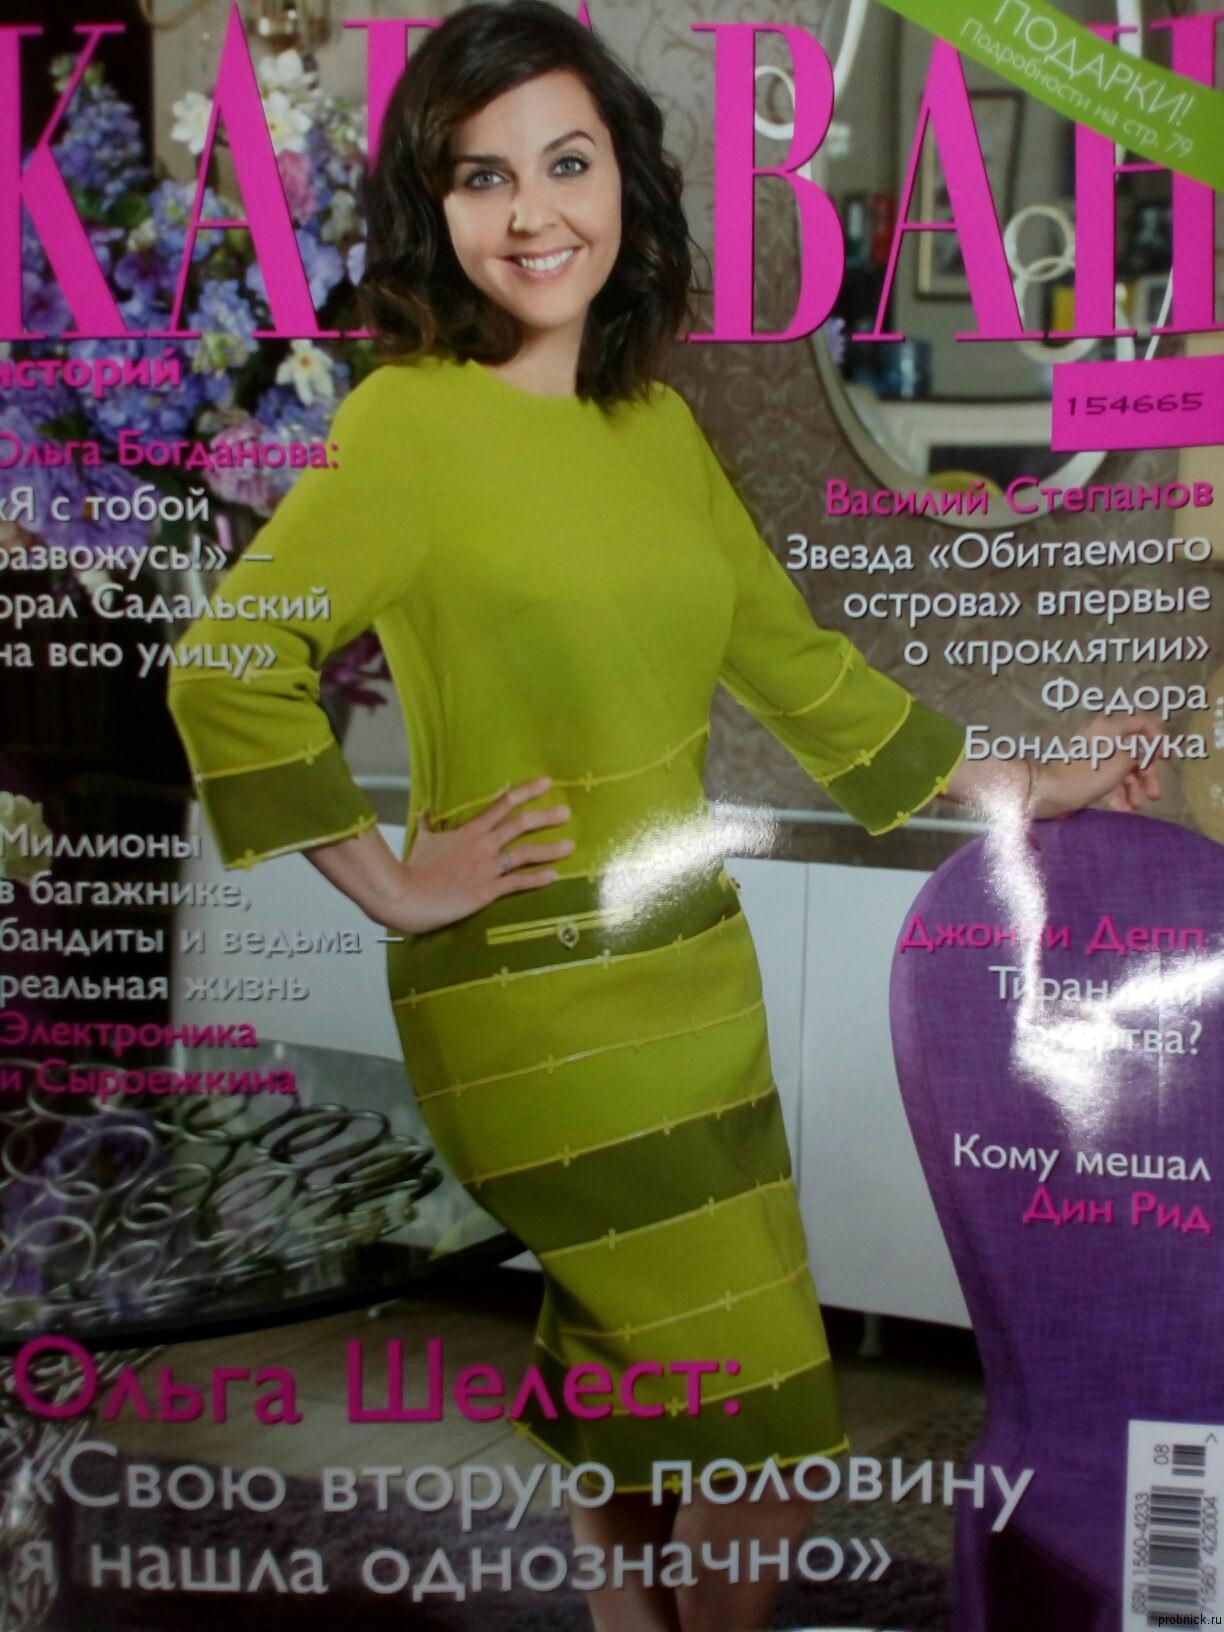 Karavan_istoriy_avgust_2016_1